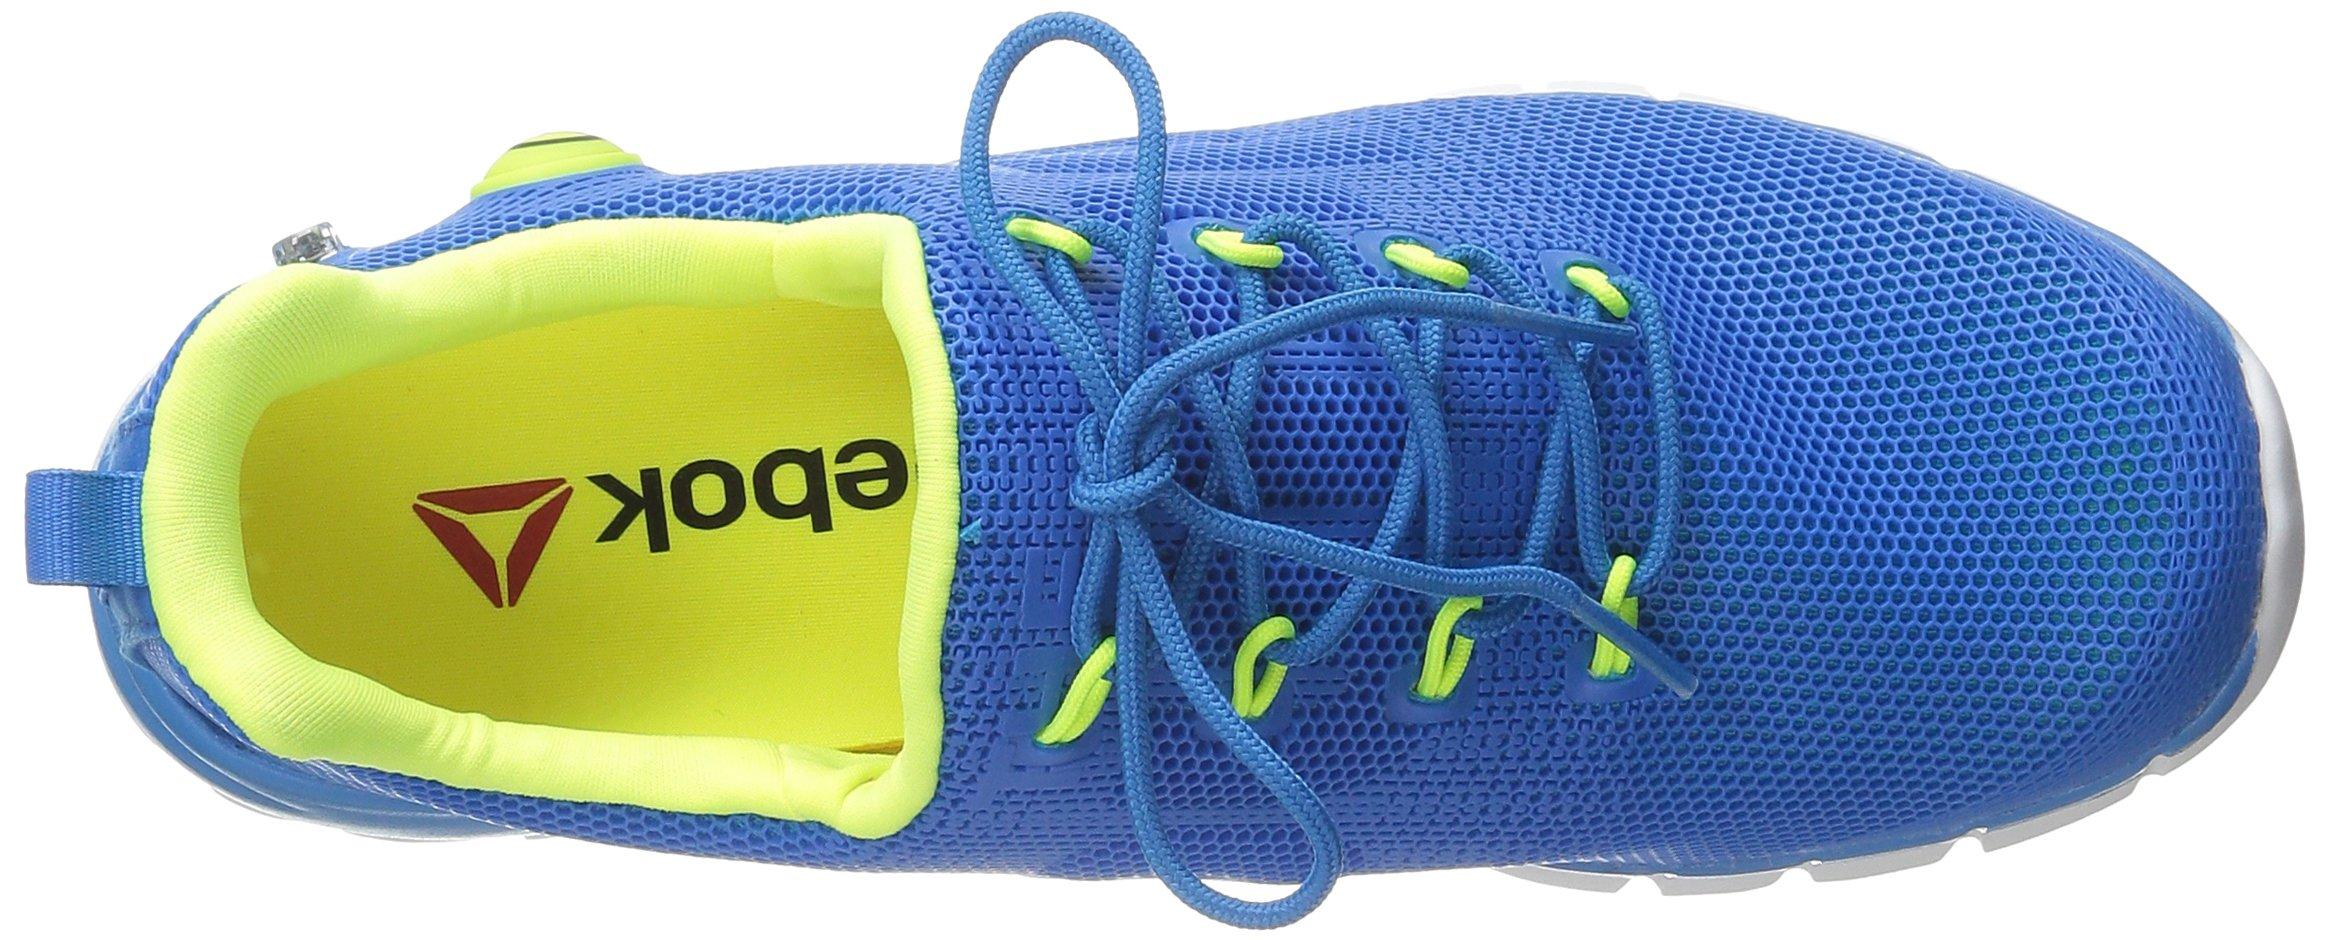 81 LMWGNHpL - Reebok Women's Z Pump Fusion Polyurethane Running Shoe